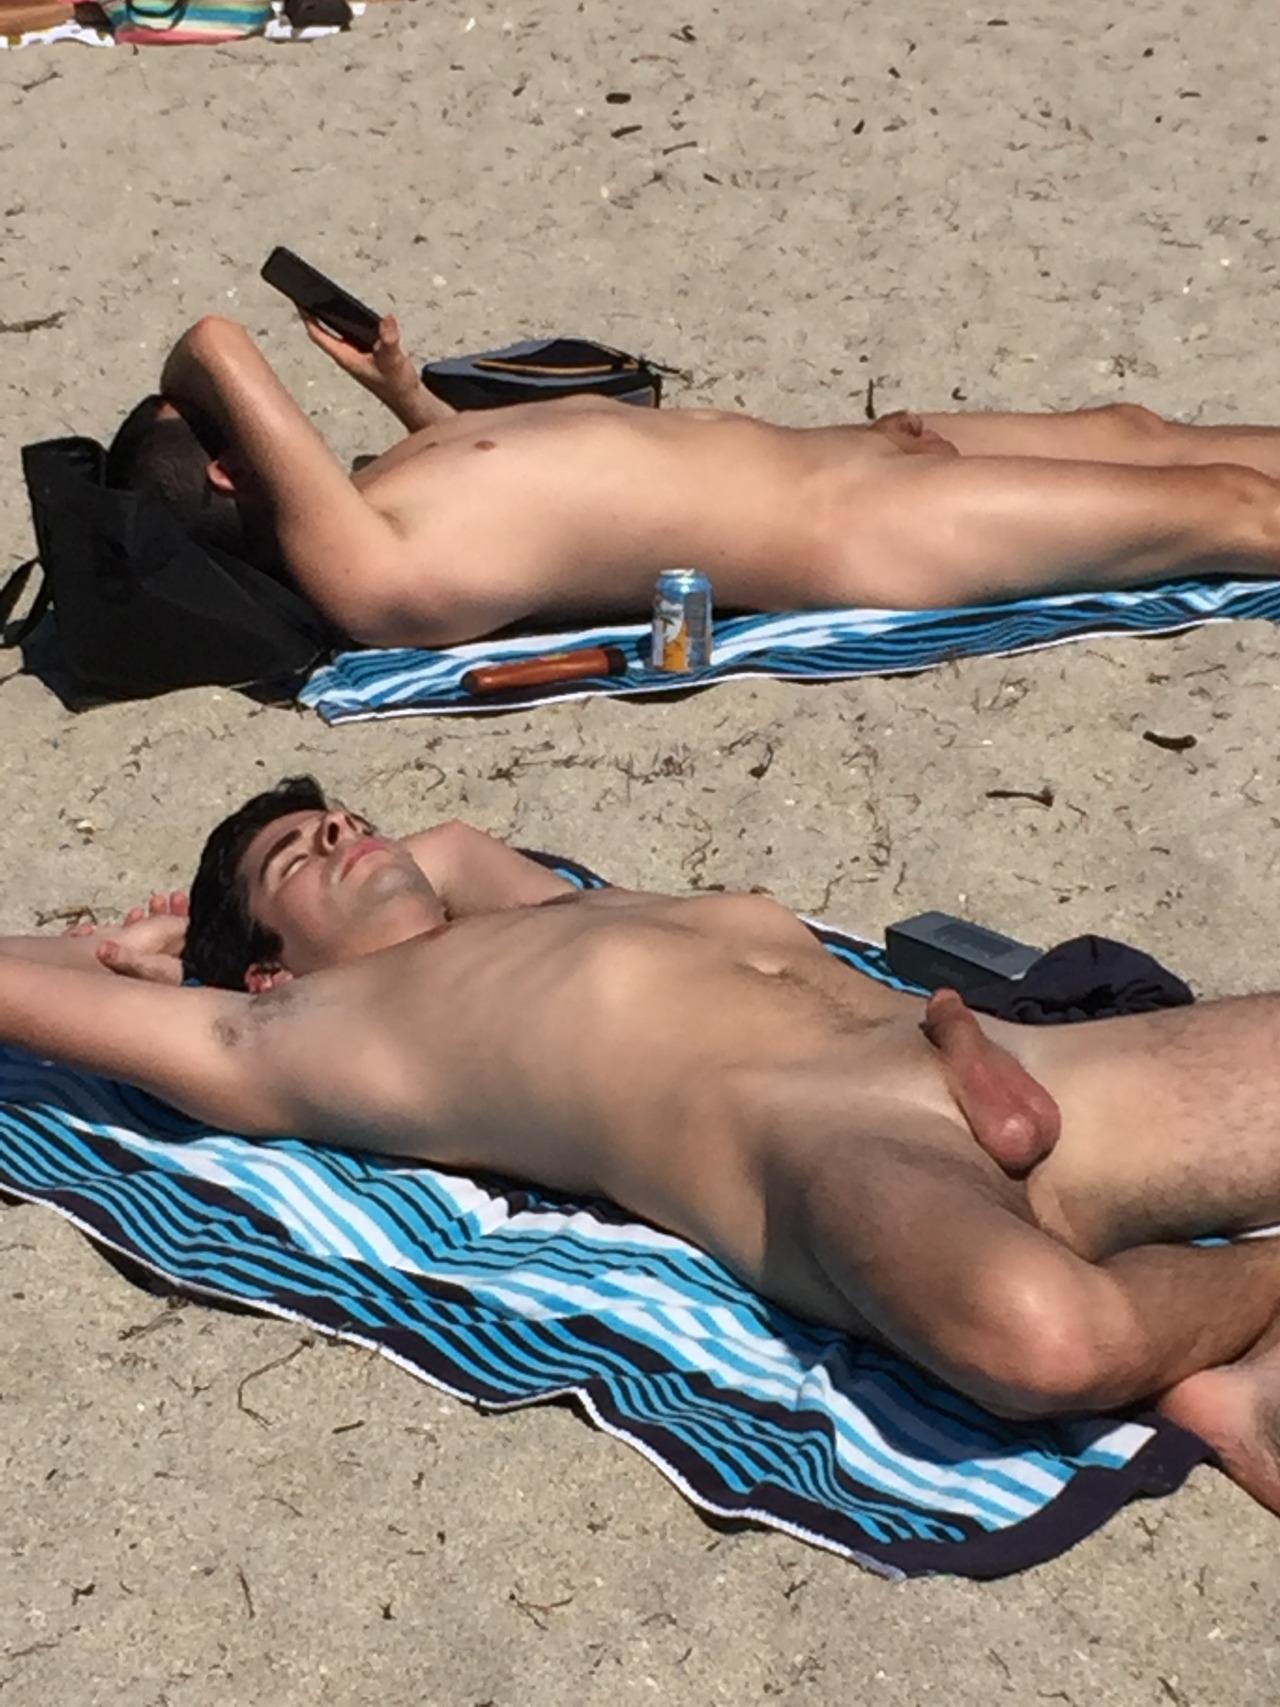 nude beach spycamdude